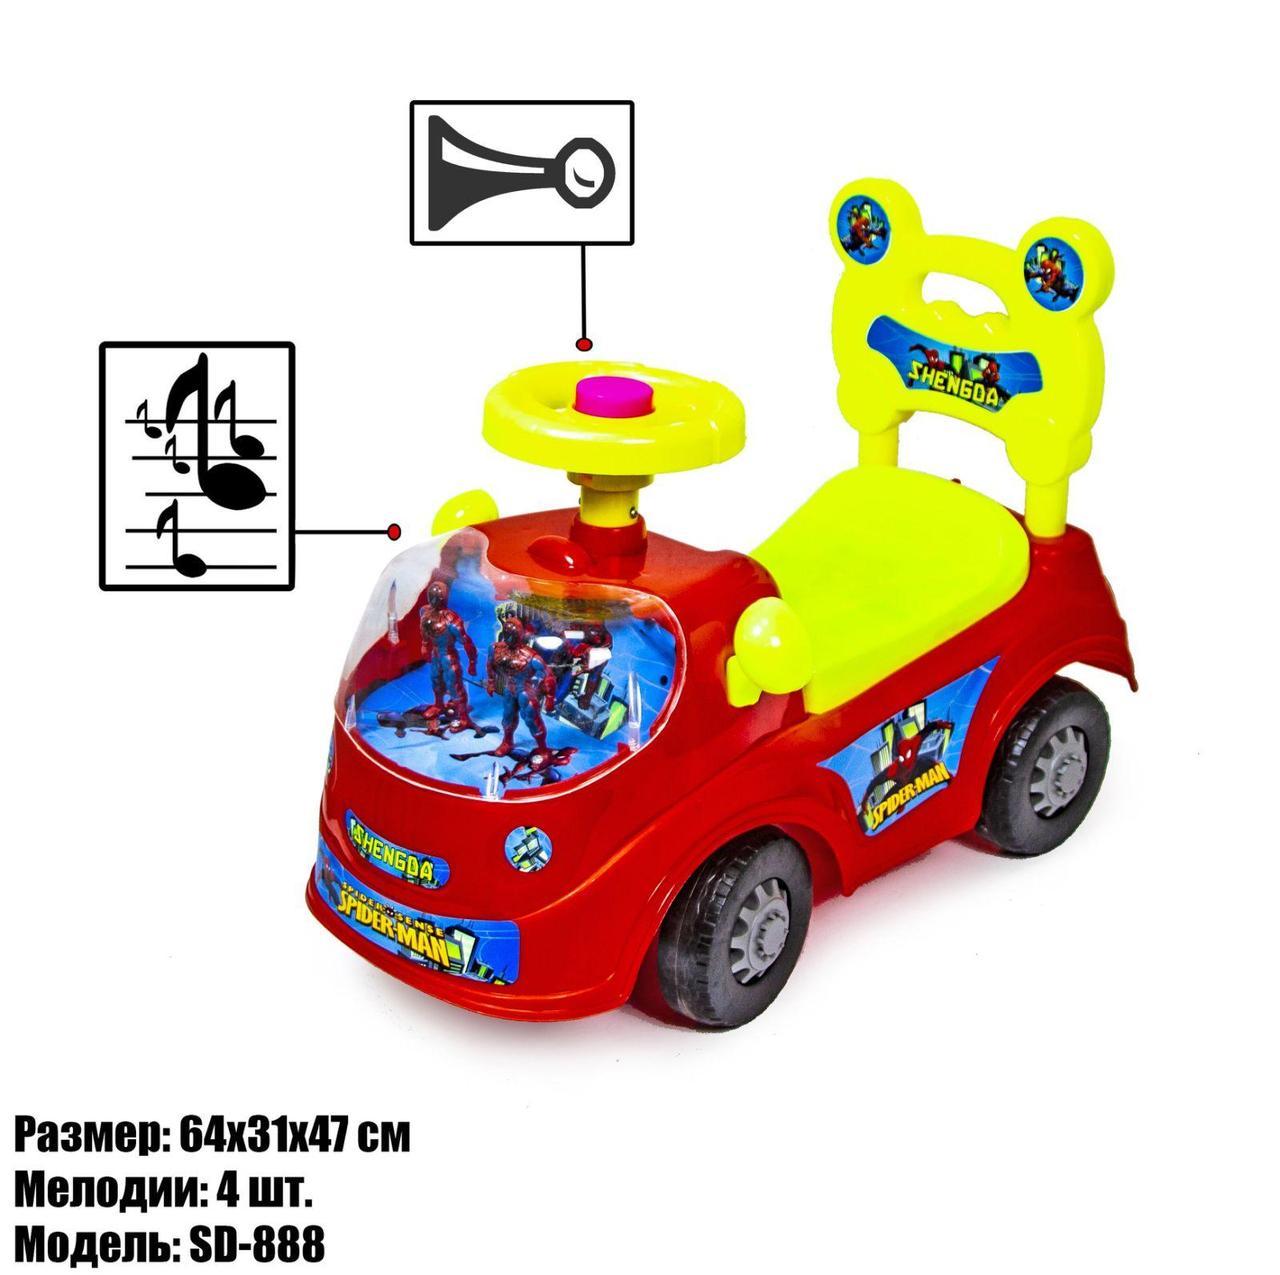 Машинка каталка толокар Spiderman 888 красный